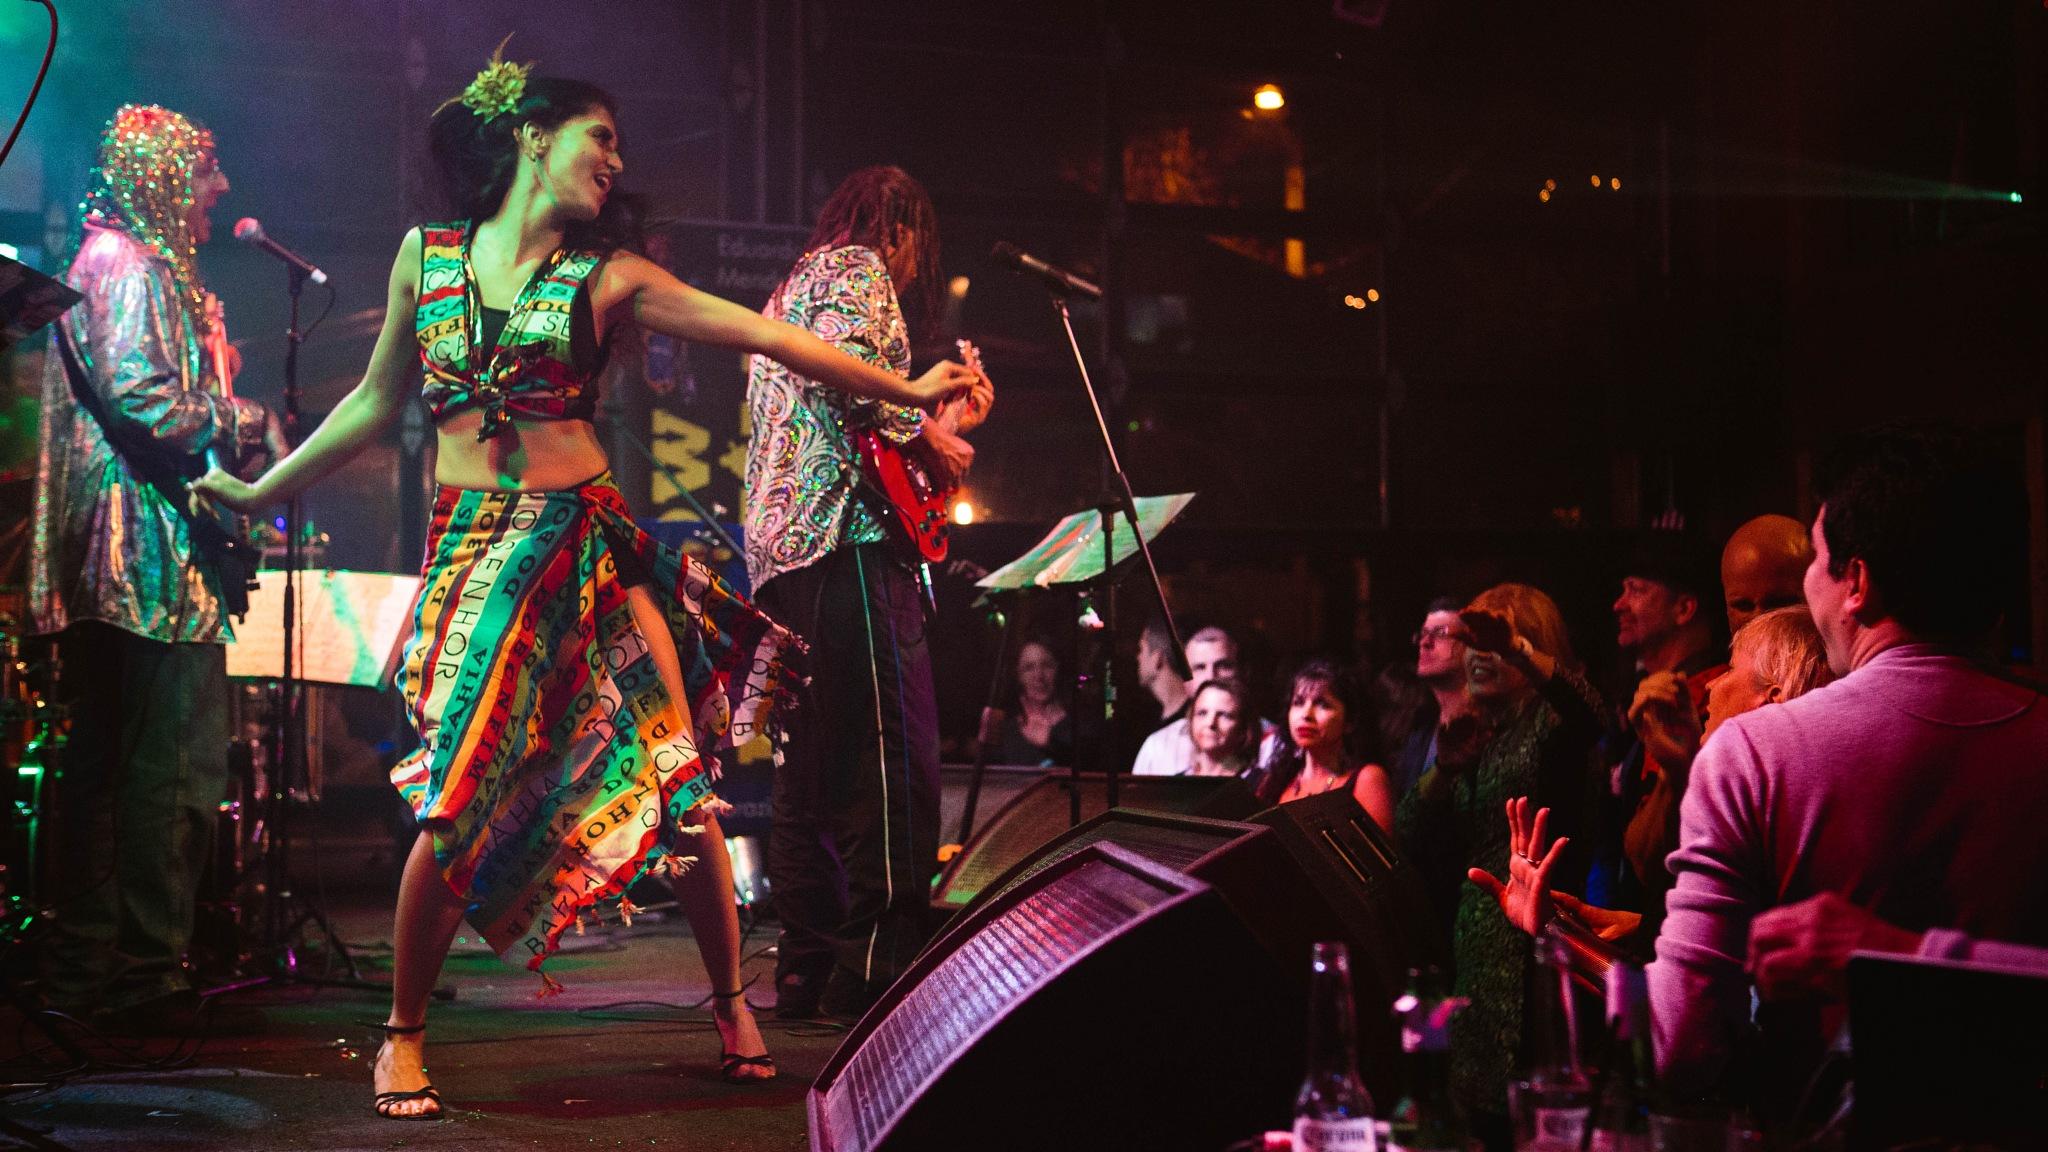 Brazilian Festival by photoigorsolovey